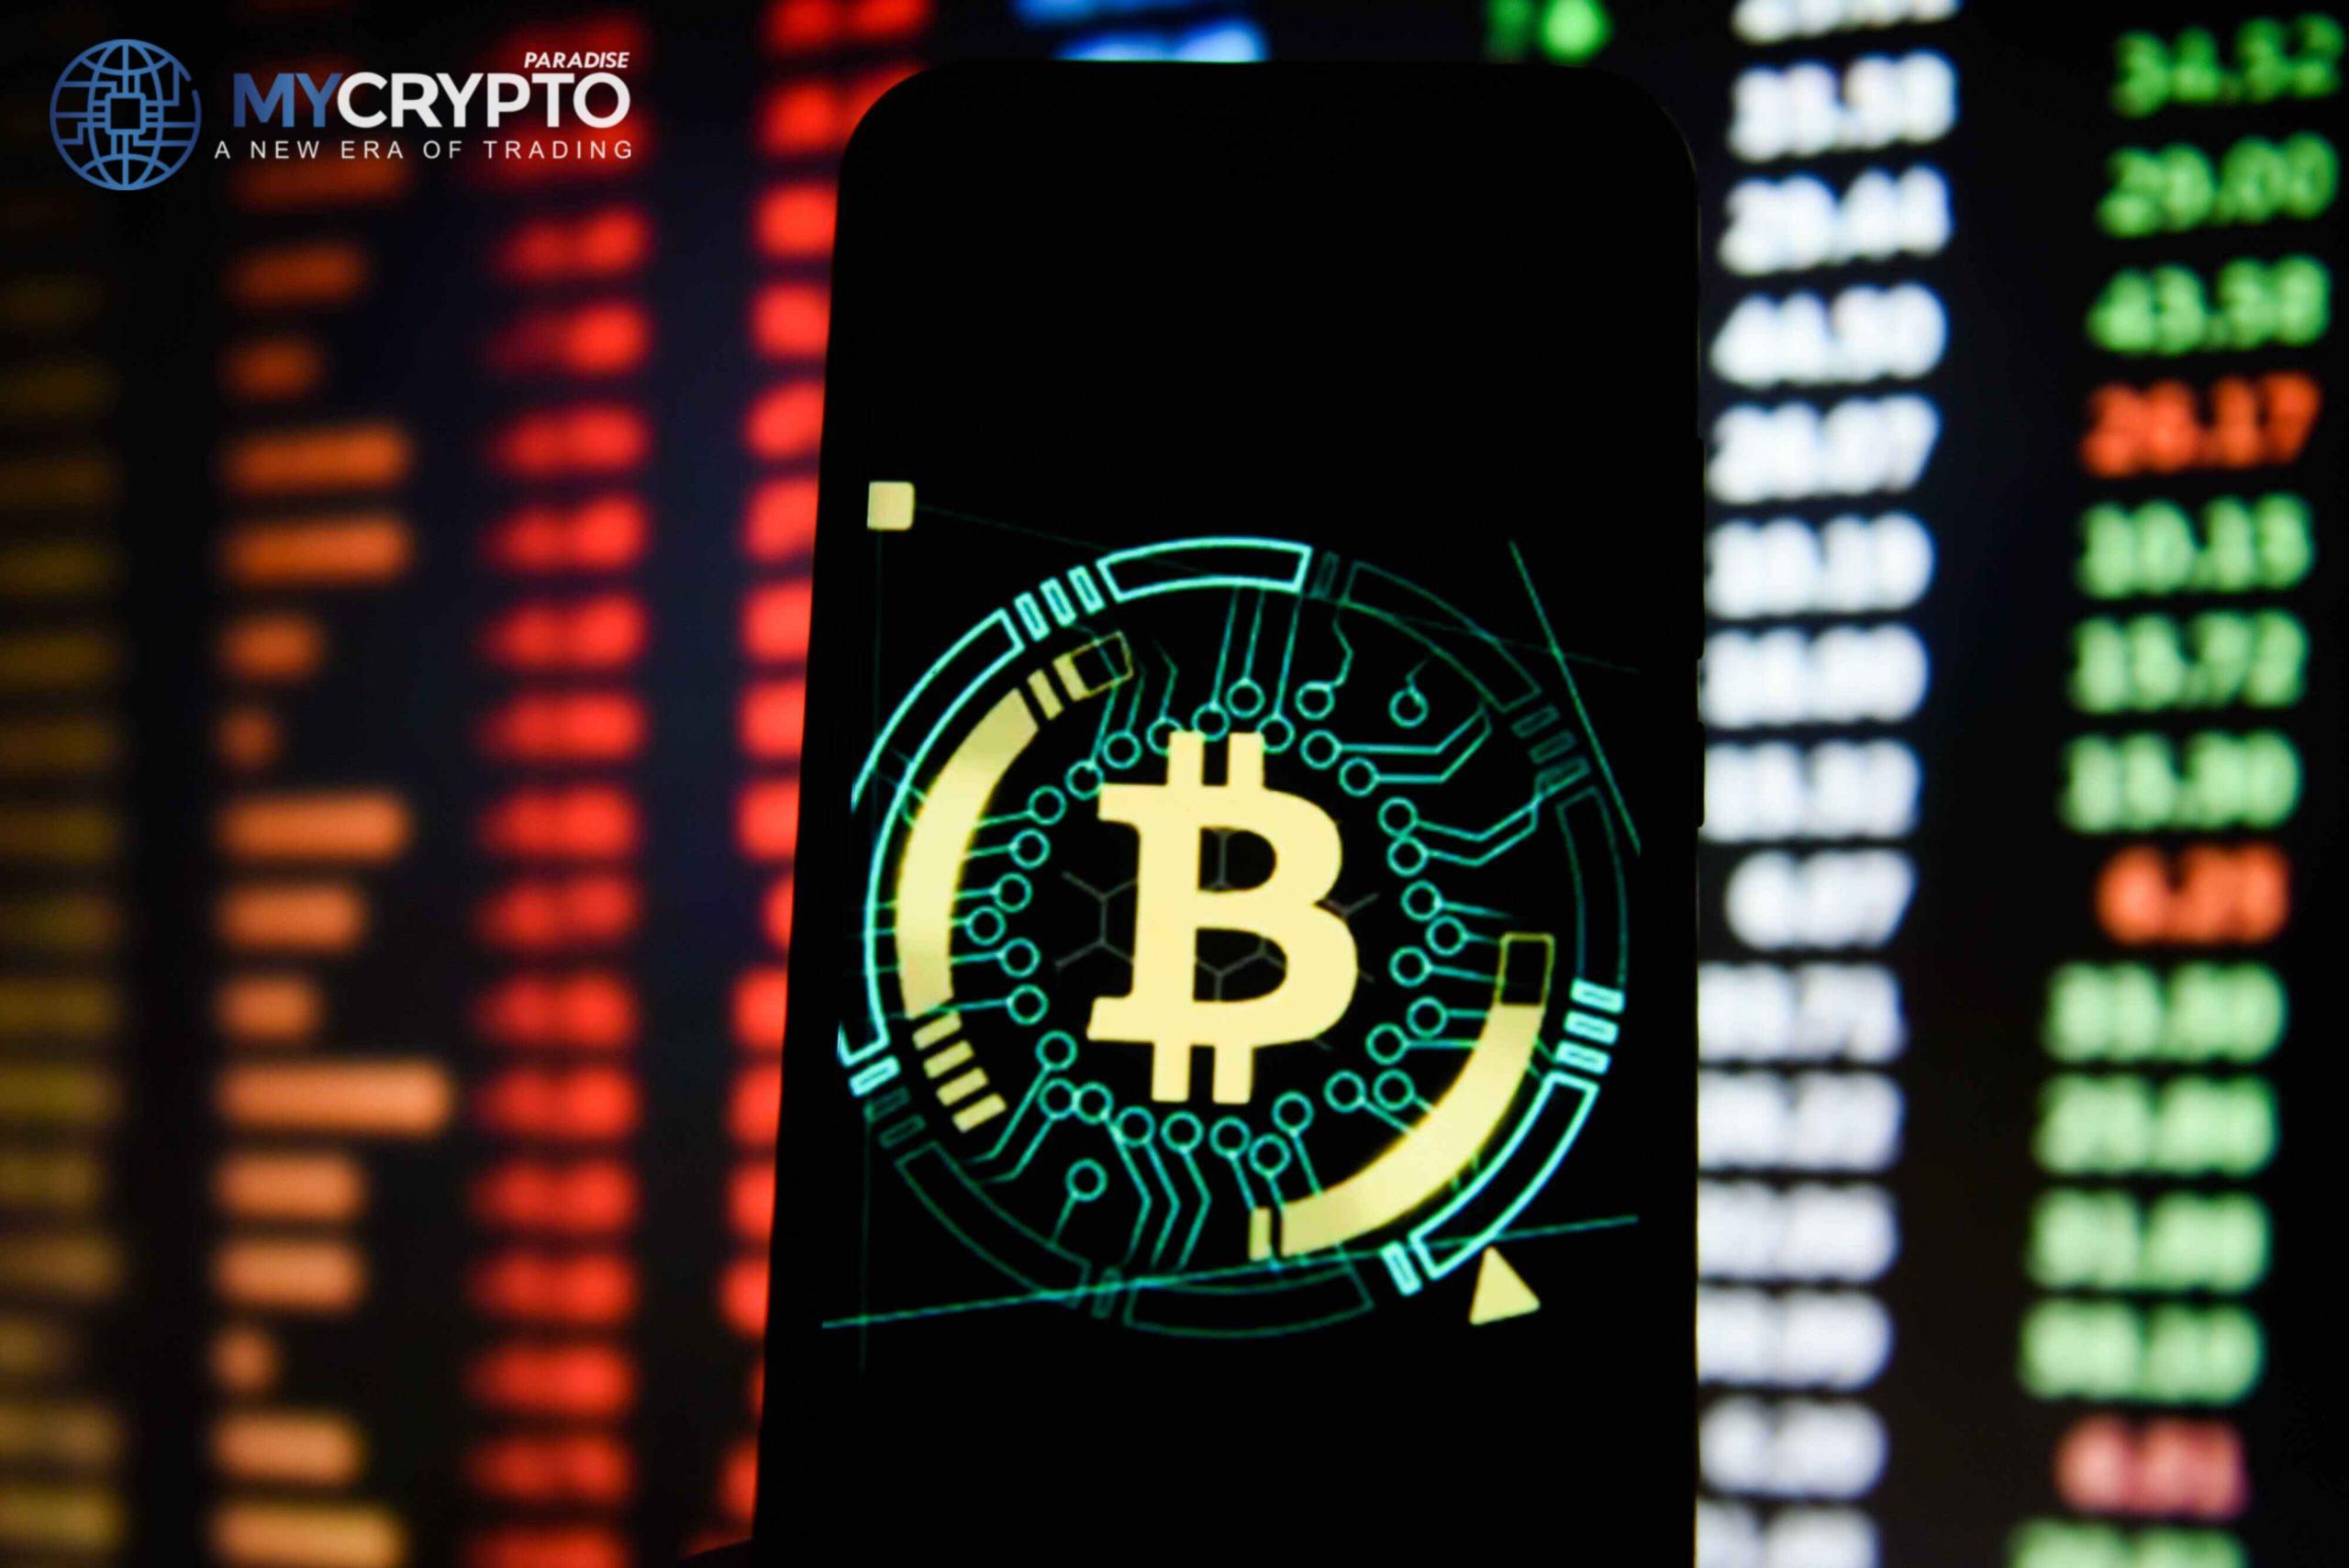 Le prix du Bitcoin a bondi